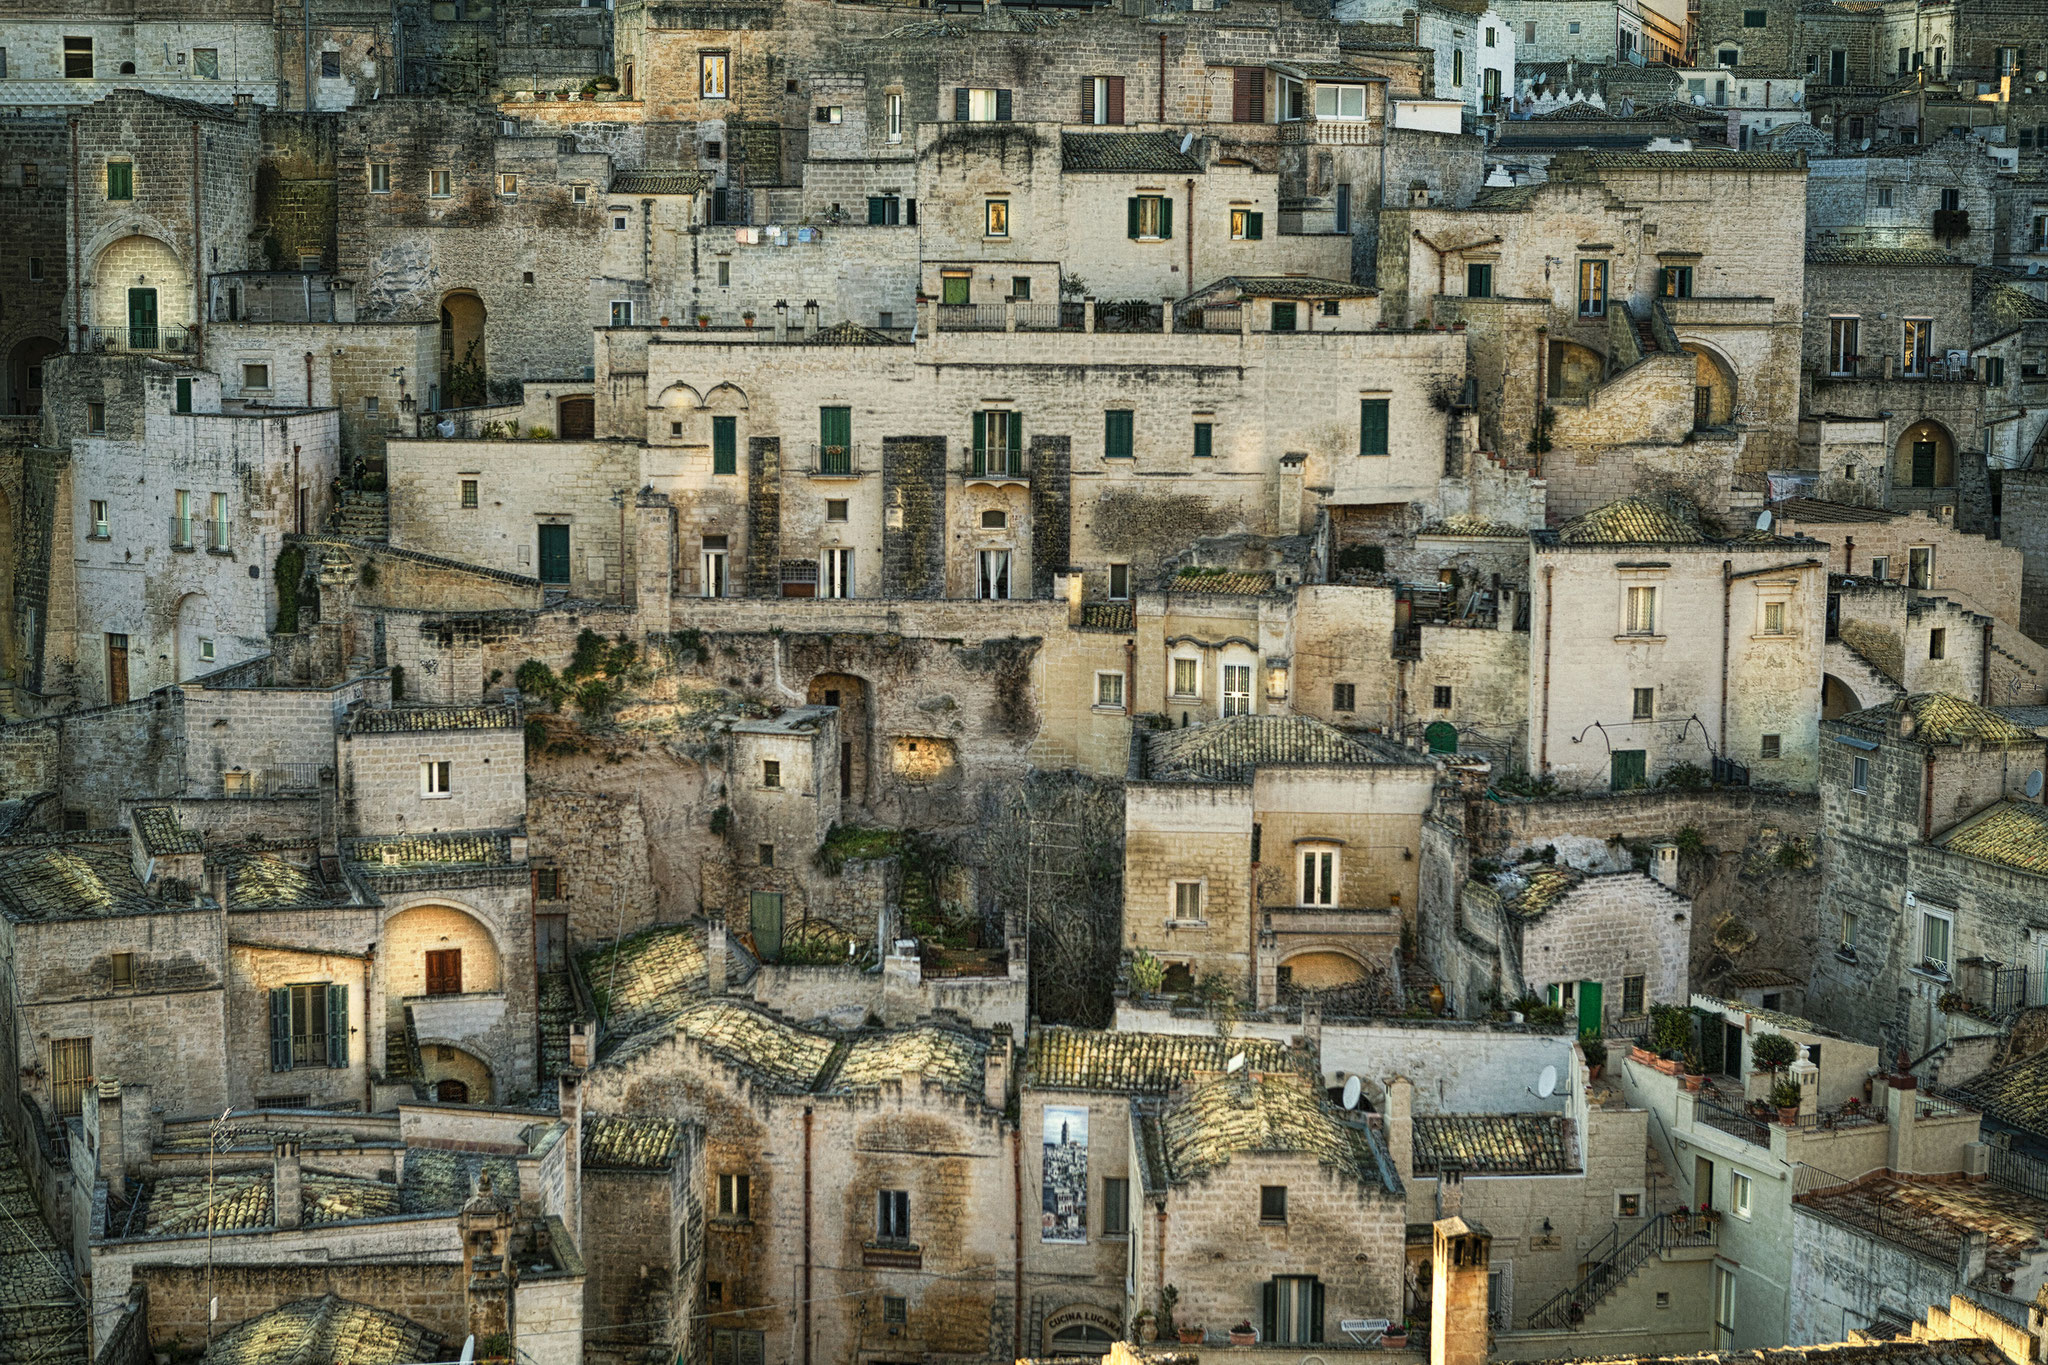 Falcone Francesco-EFIAP (Manfredonia-I) - Matera (I)